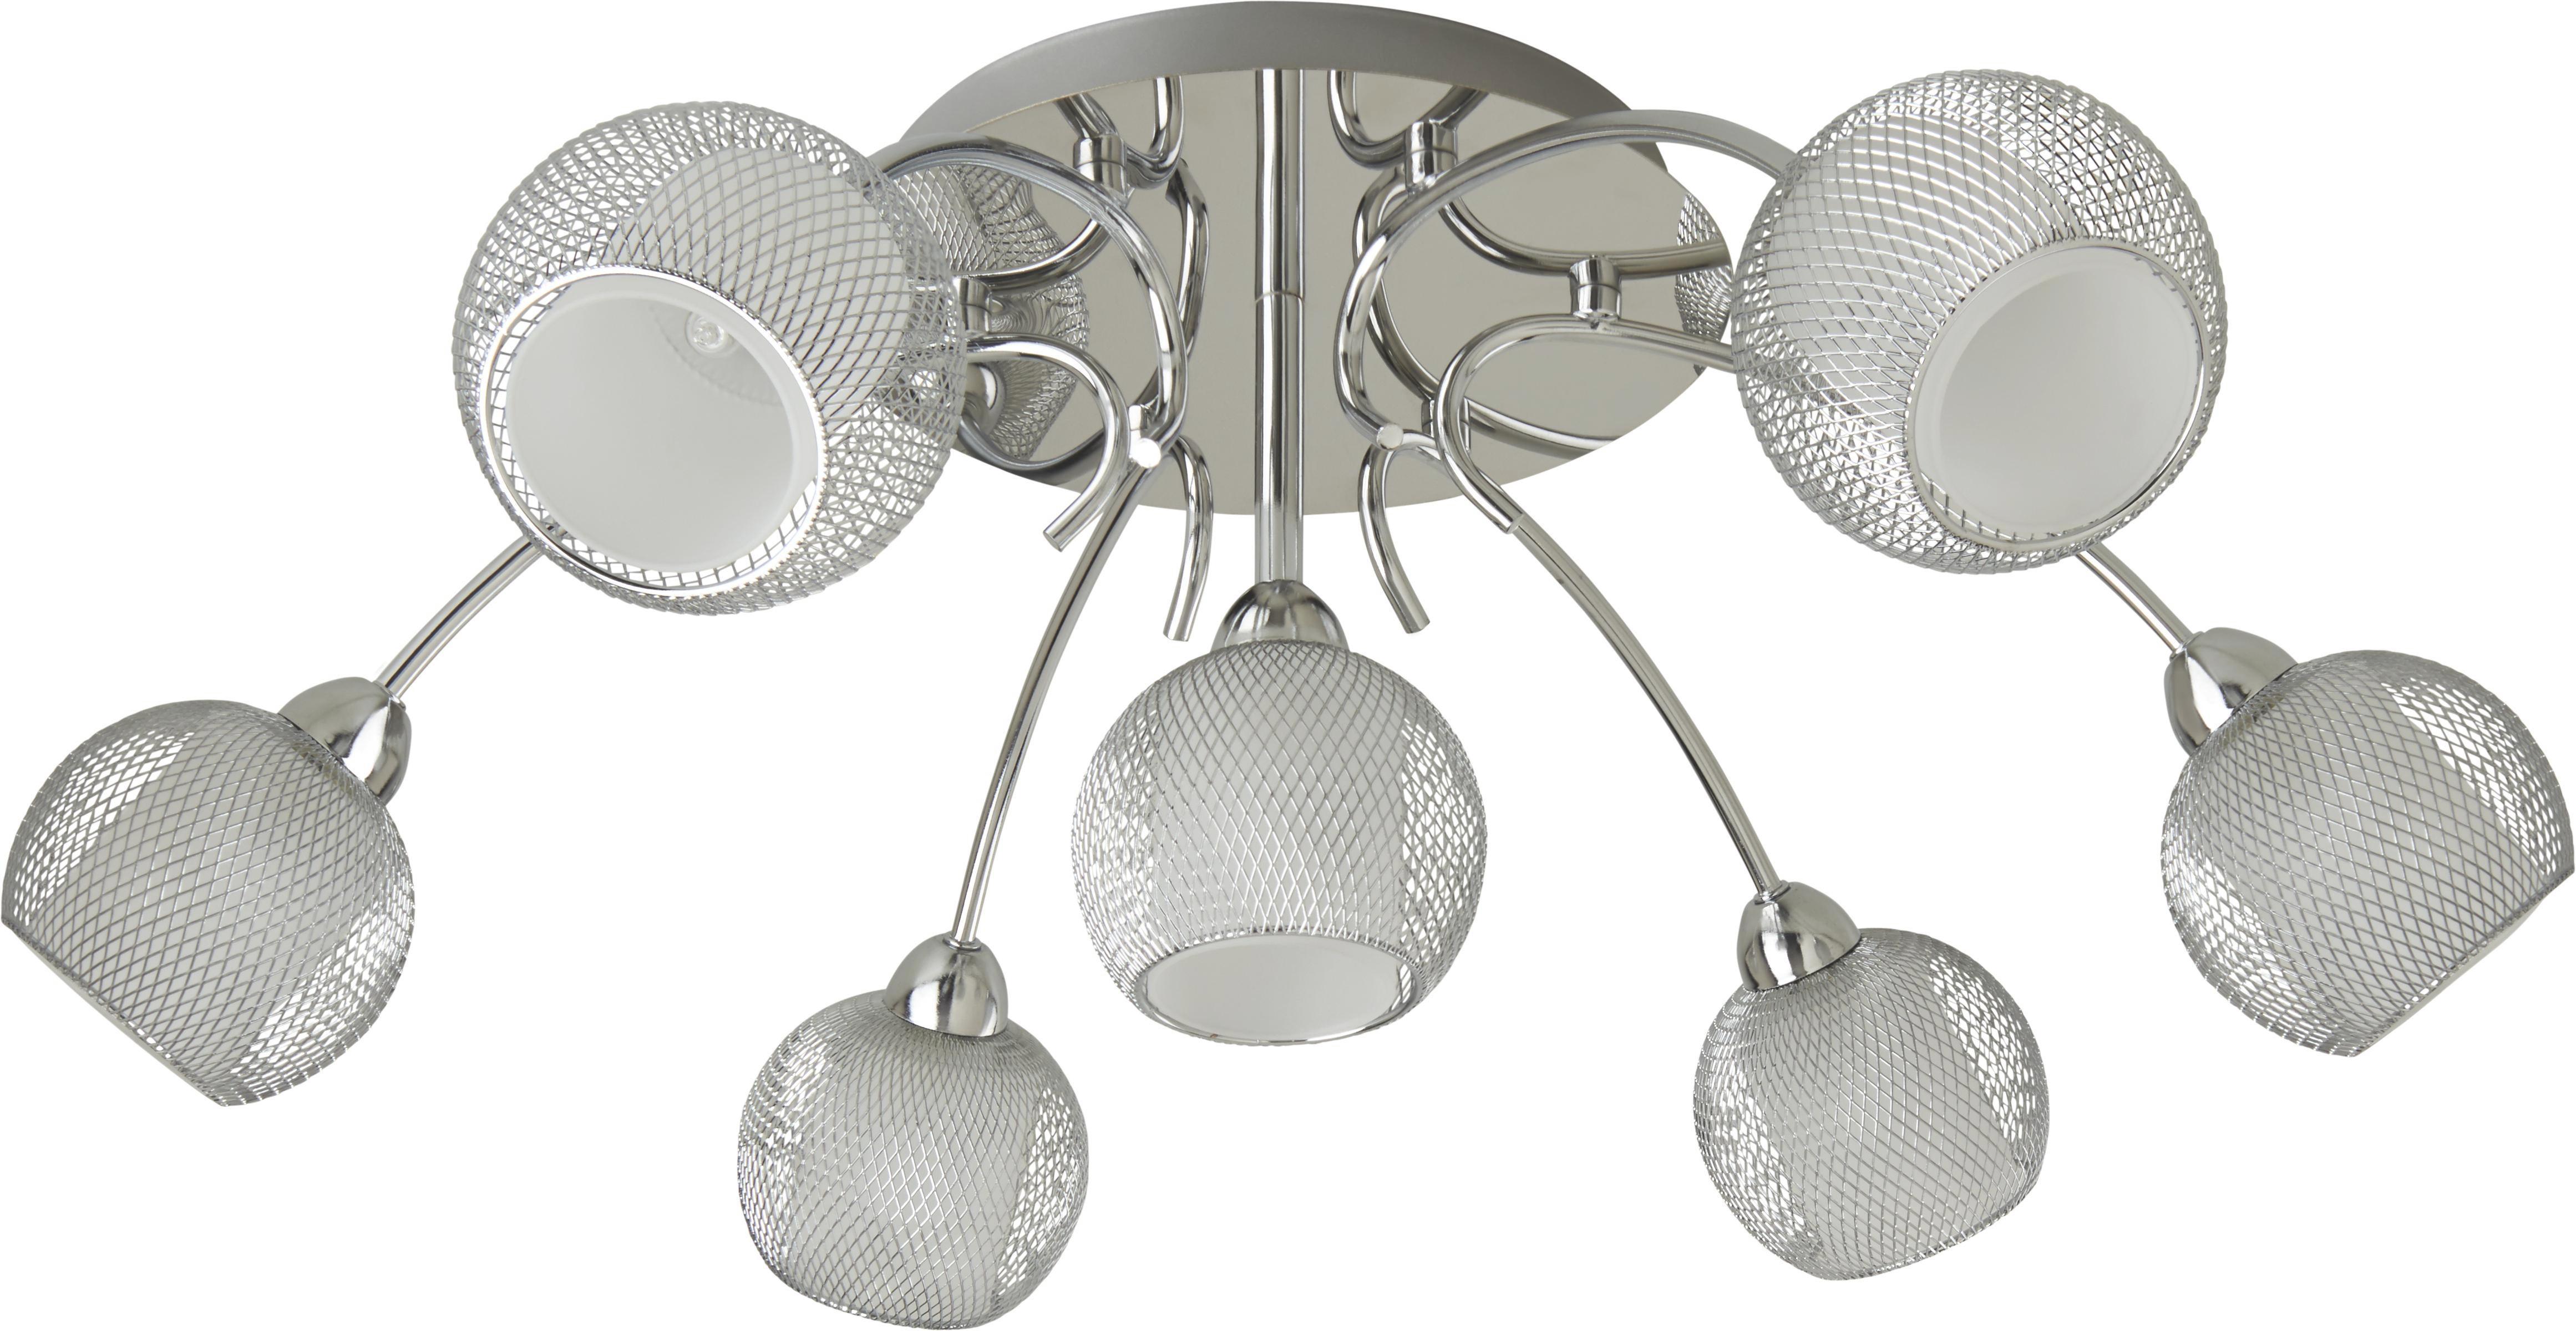 LED-Deckenleuchte Bovary - Chromfarben, MODERN, Glas/Metall (65/65/20cm) - MÖMAX modern living